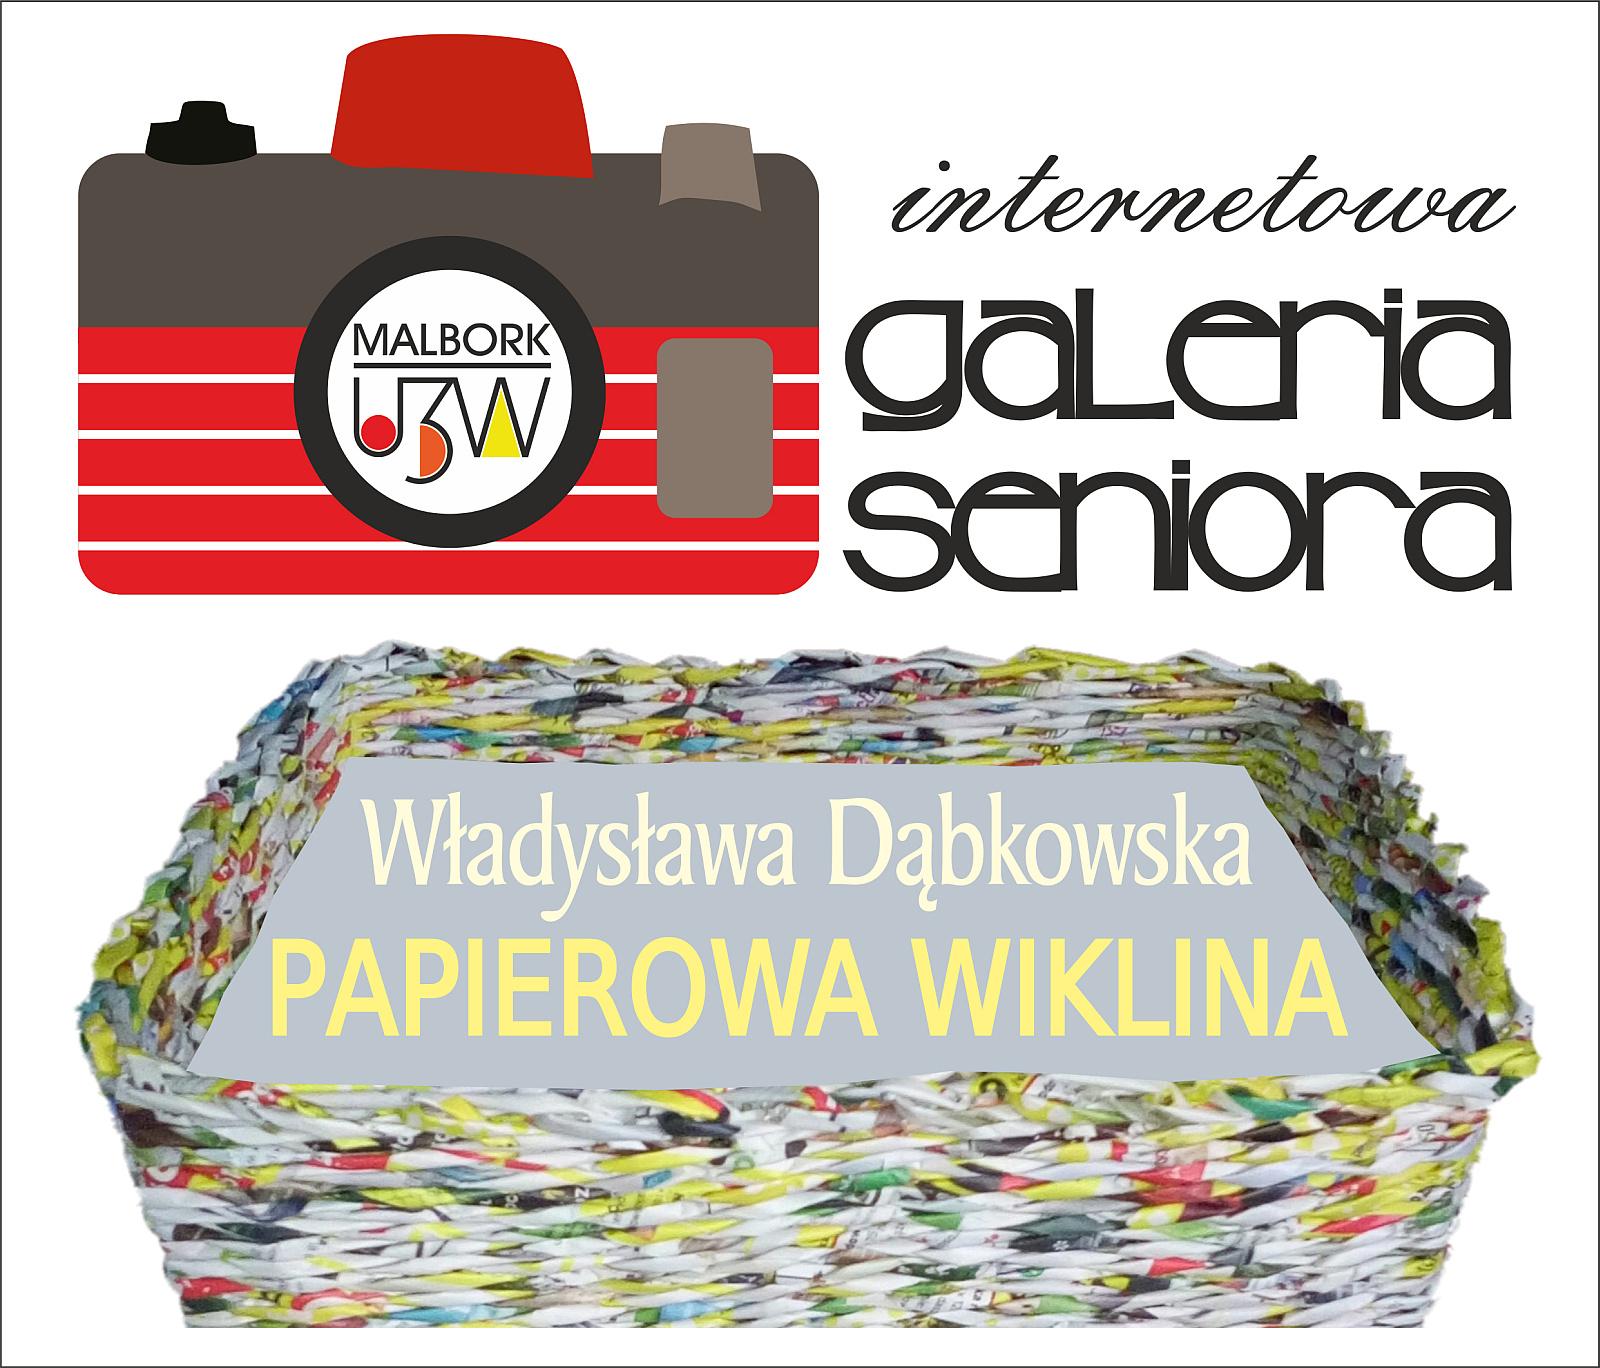 GaleriaWikPap